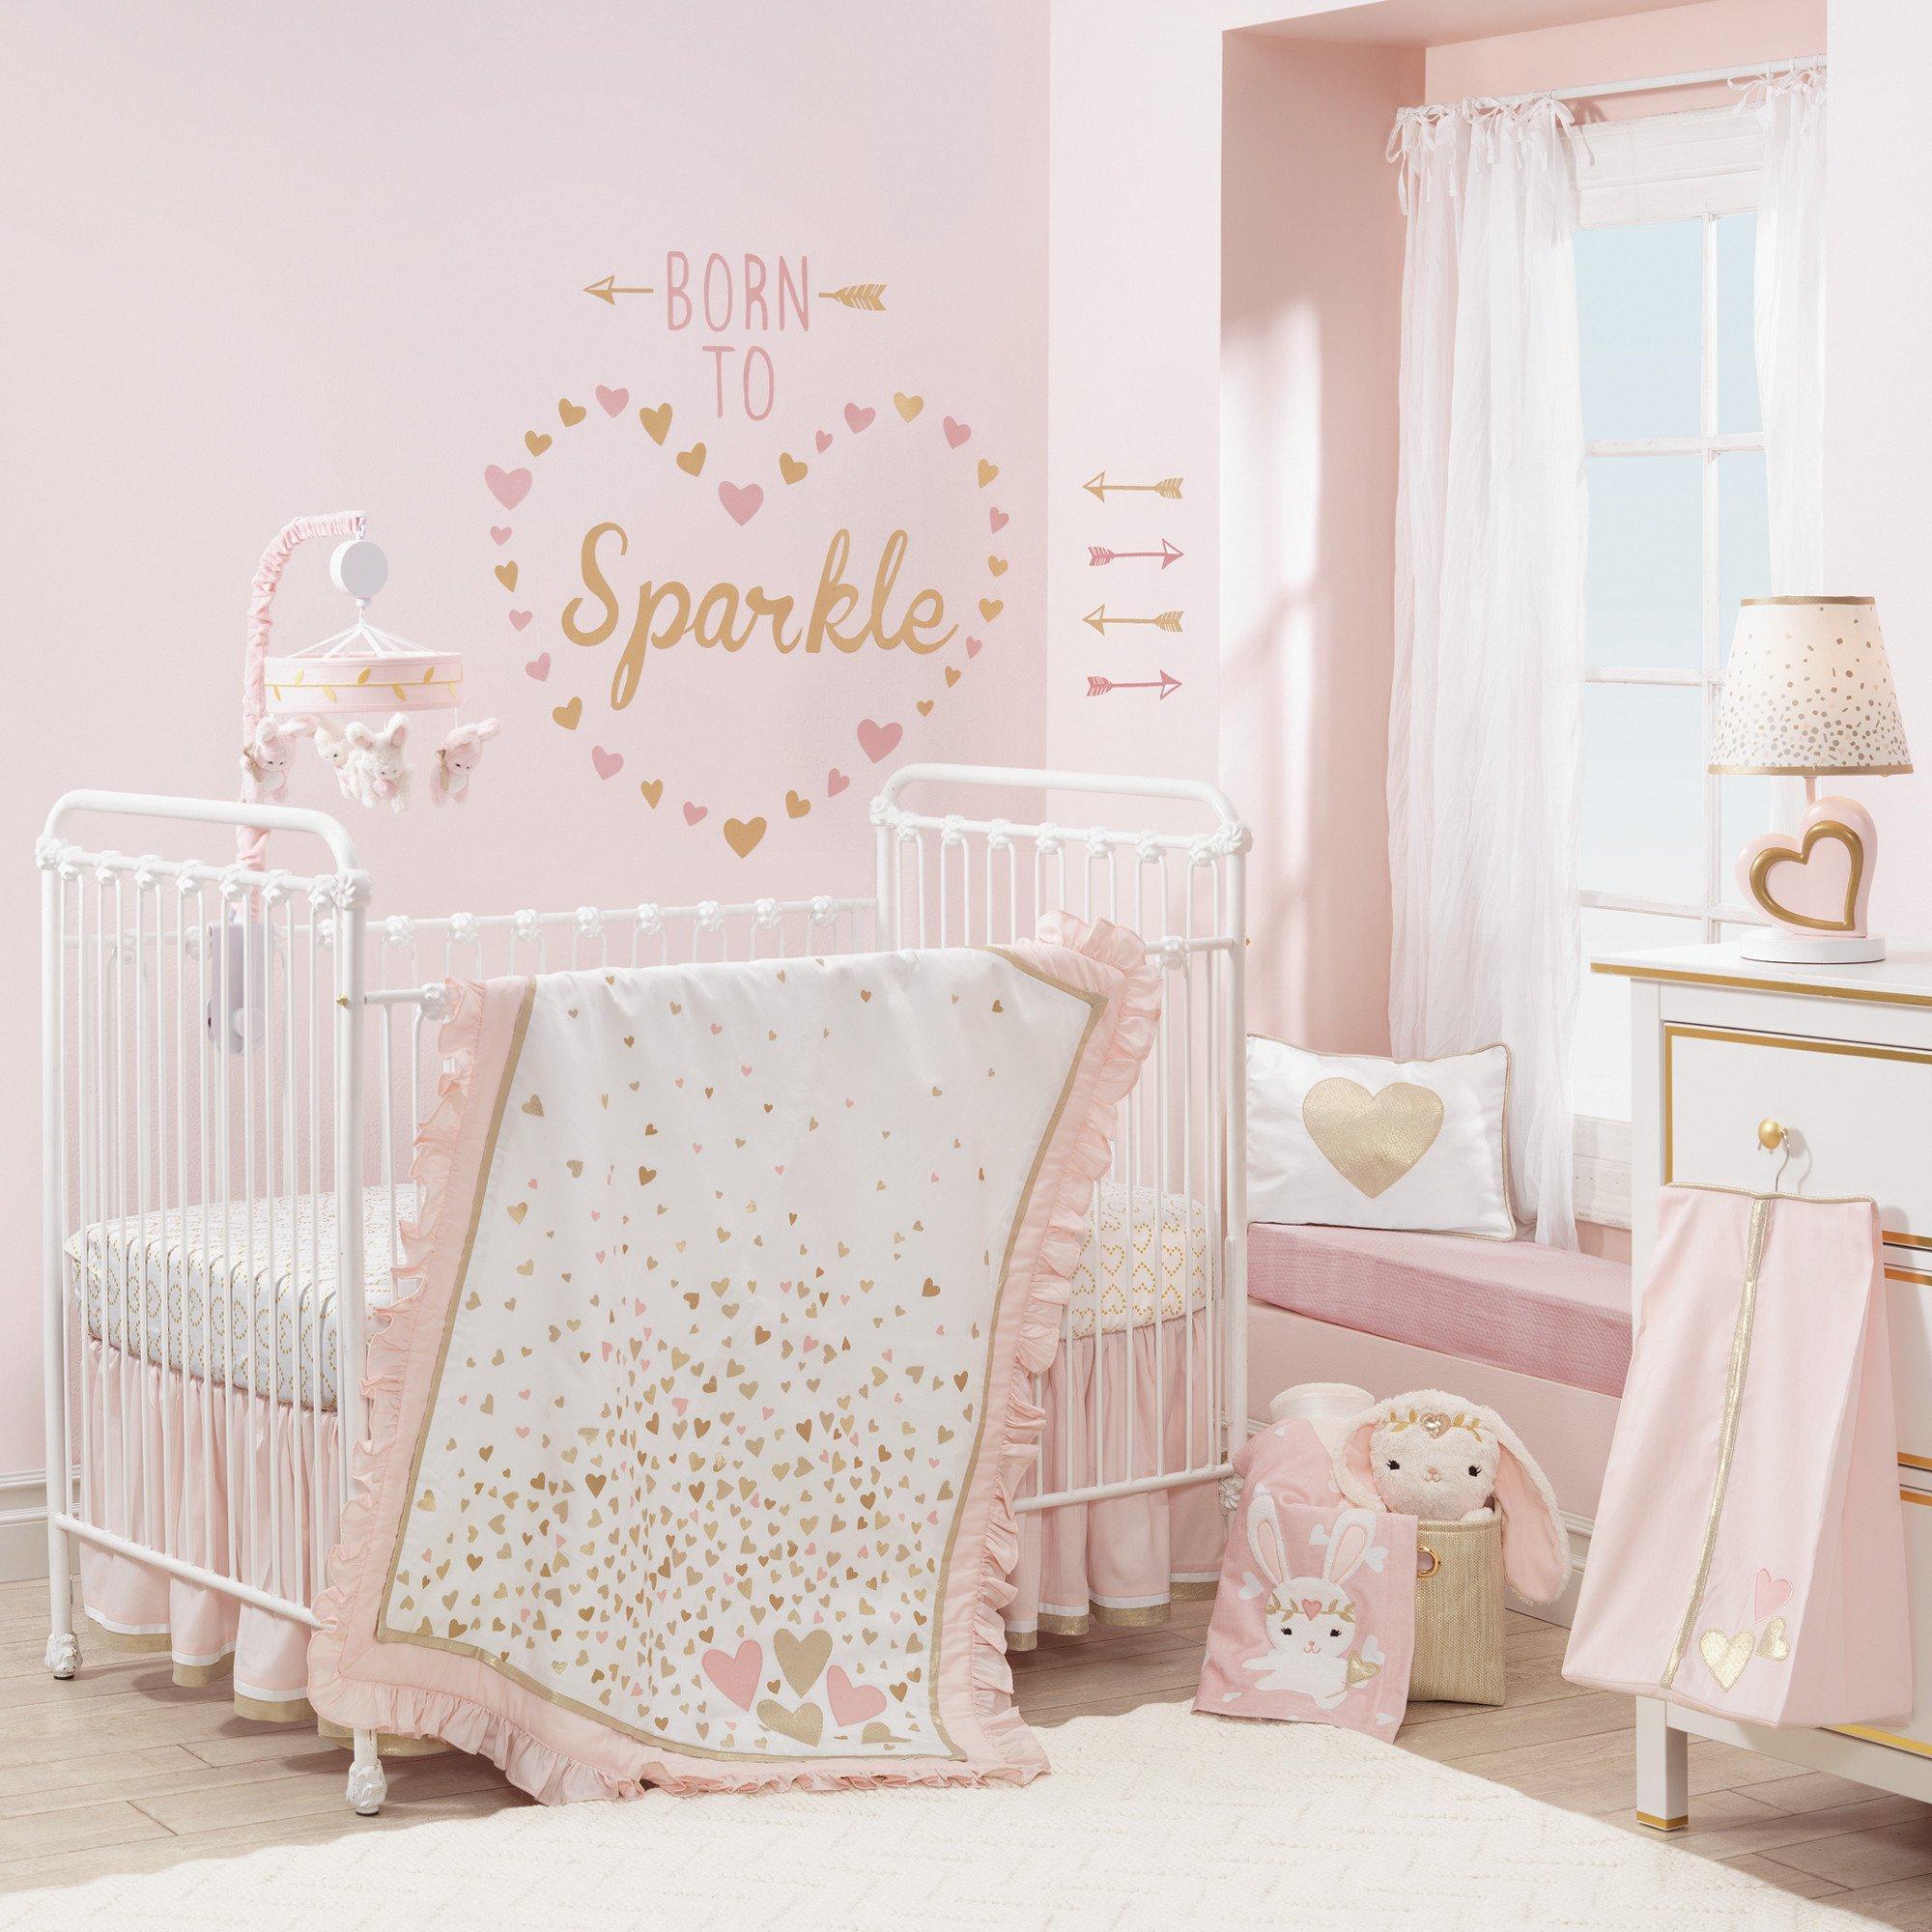 Lambs Ivy Confetti 4 Piece Crib Bedding Set Pink Gold White Love Hearts Walmart Com Walmart Com In 2020 Heart Nursery Crib Bedding Baby Crib Bedding Sets